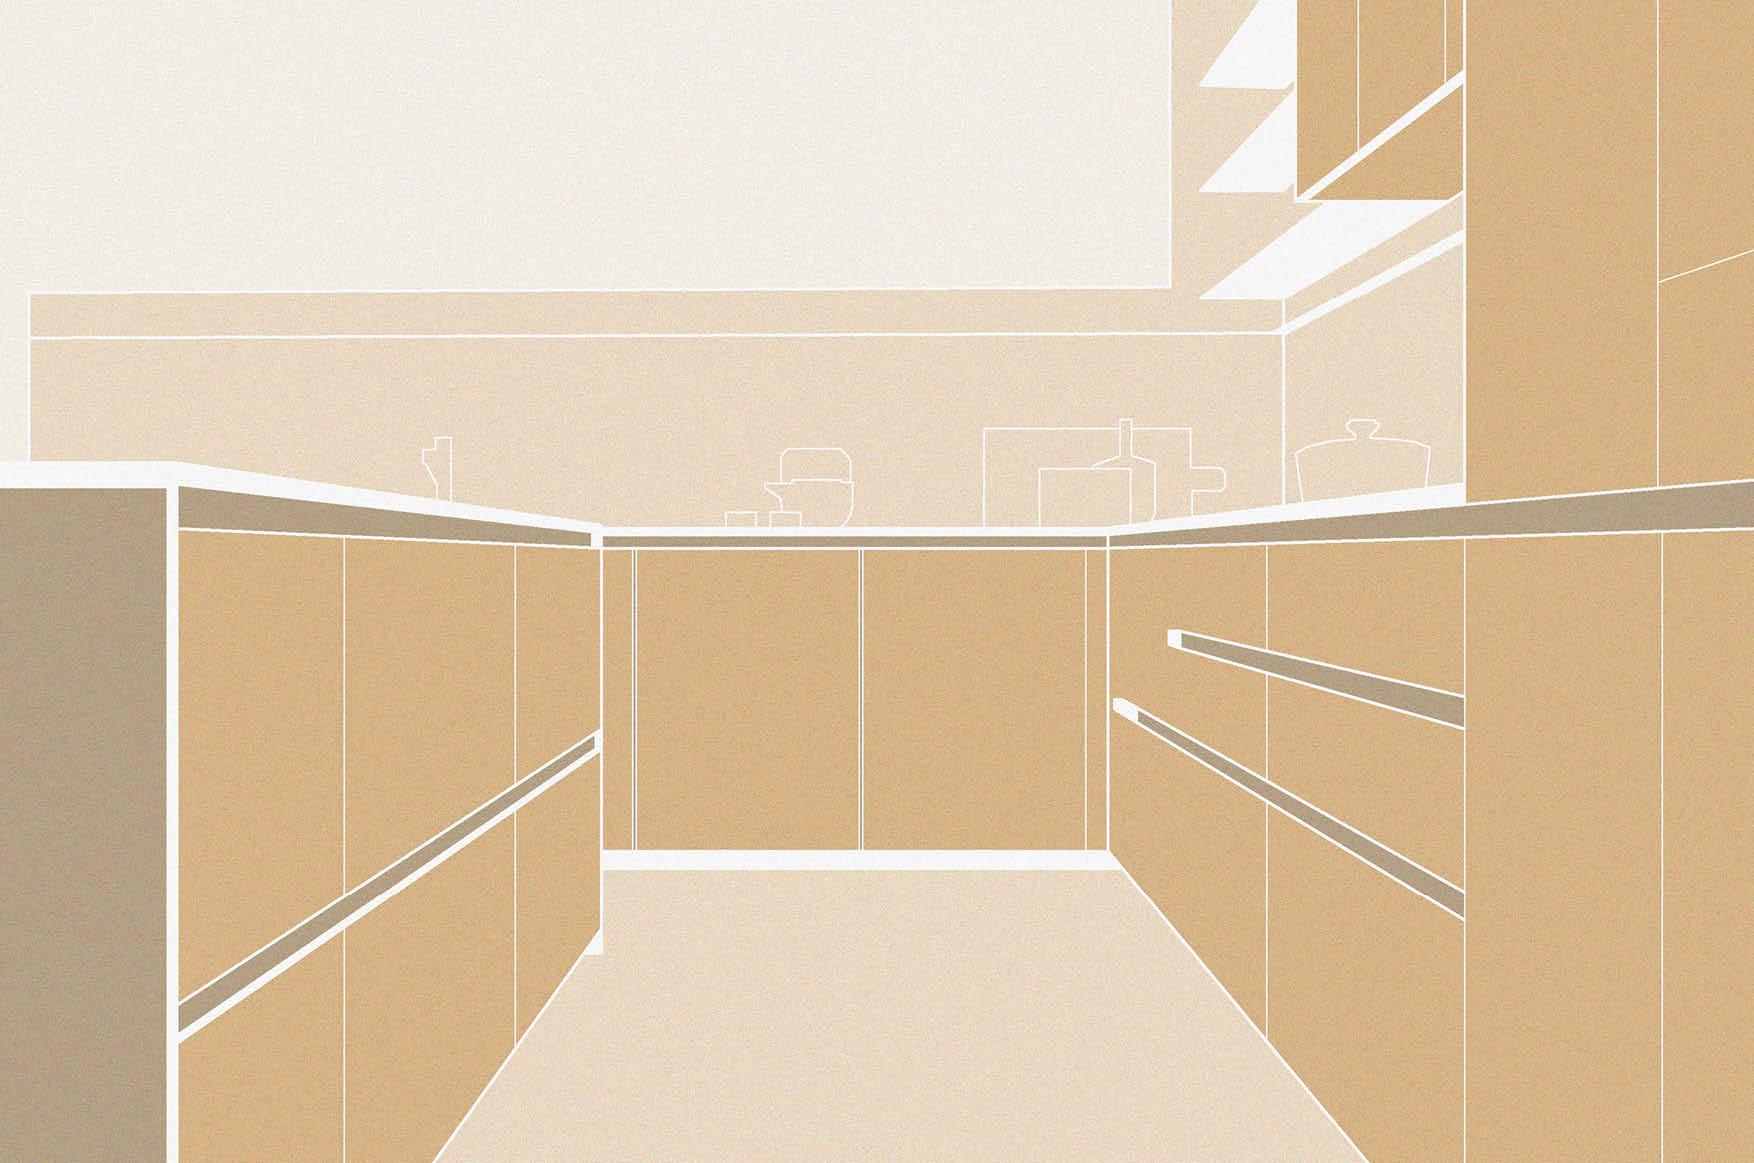 dada prime kitchen illustration by esperiri